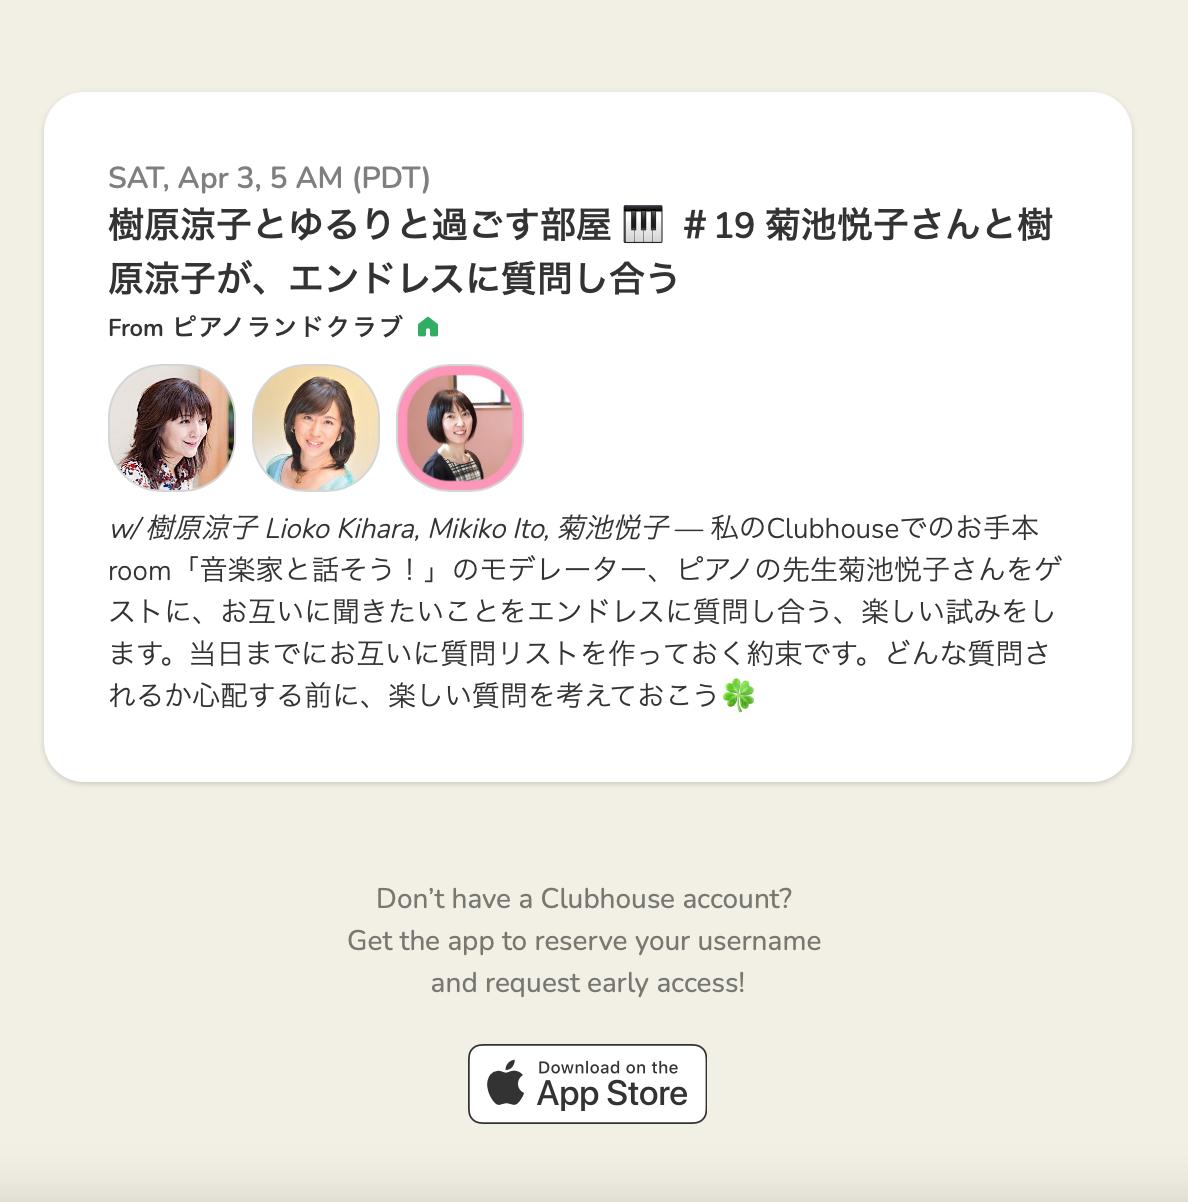 Clubhouse 樹原涼子とゆるりと過ごす部屋 🎹#19 菊池悦子さんと樹原涼子が、エンドレスに質問し合う